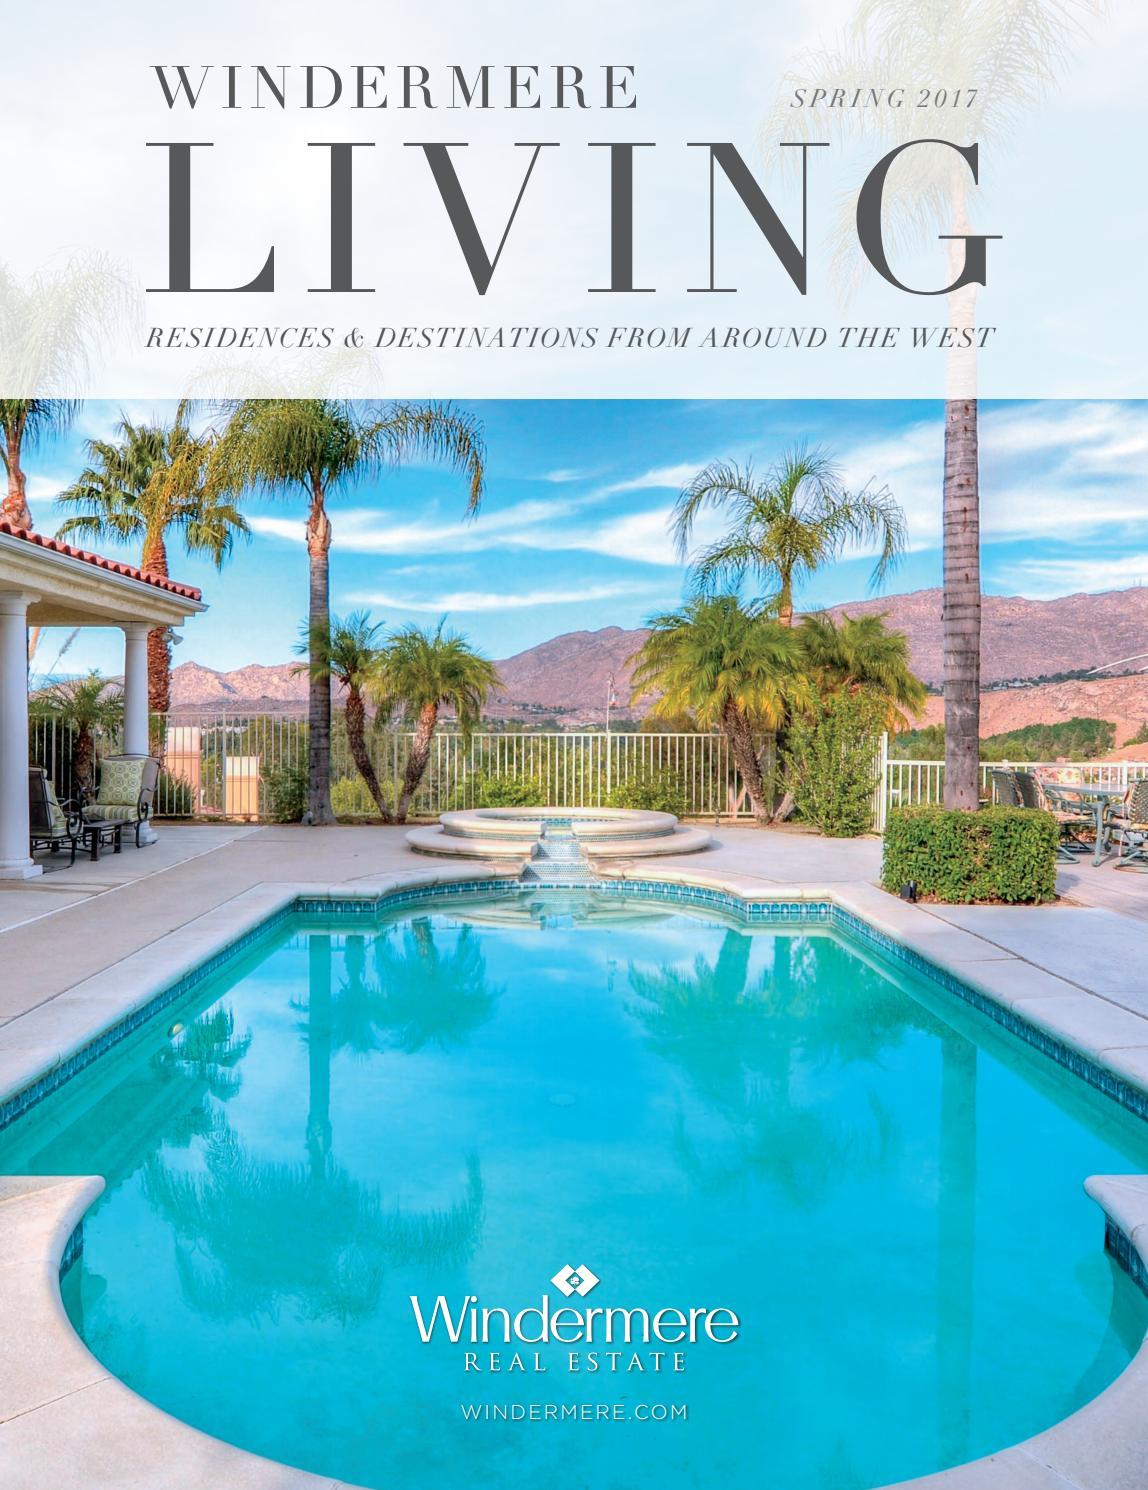 Windermere Living Spring 2017 by Windermere Real Estate - issuu